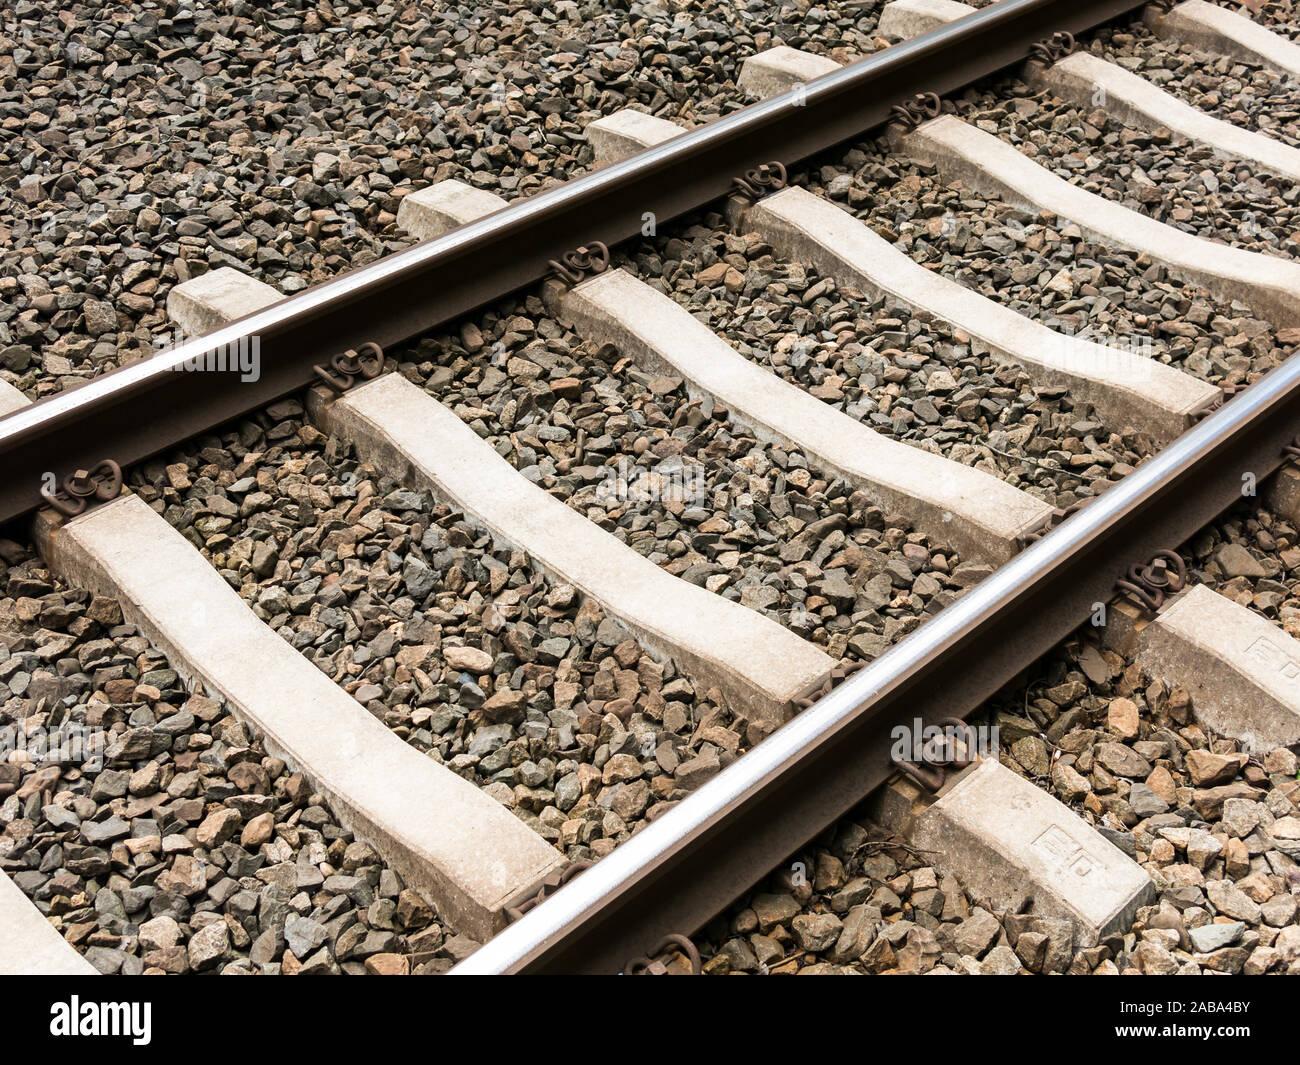 Railway Ballast Stock Photos & Railway Ballast Stock Images - Alamy